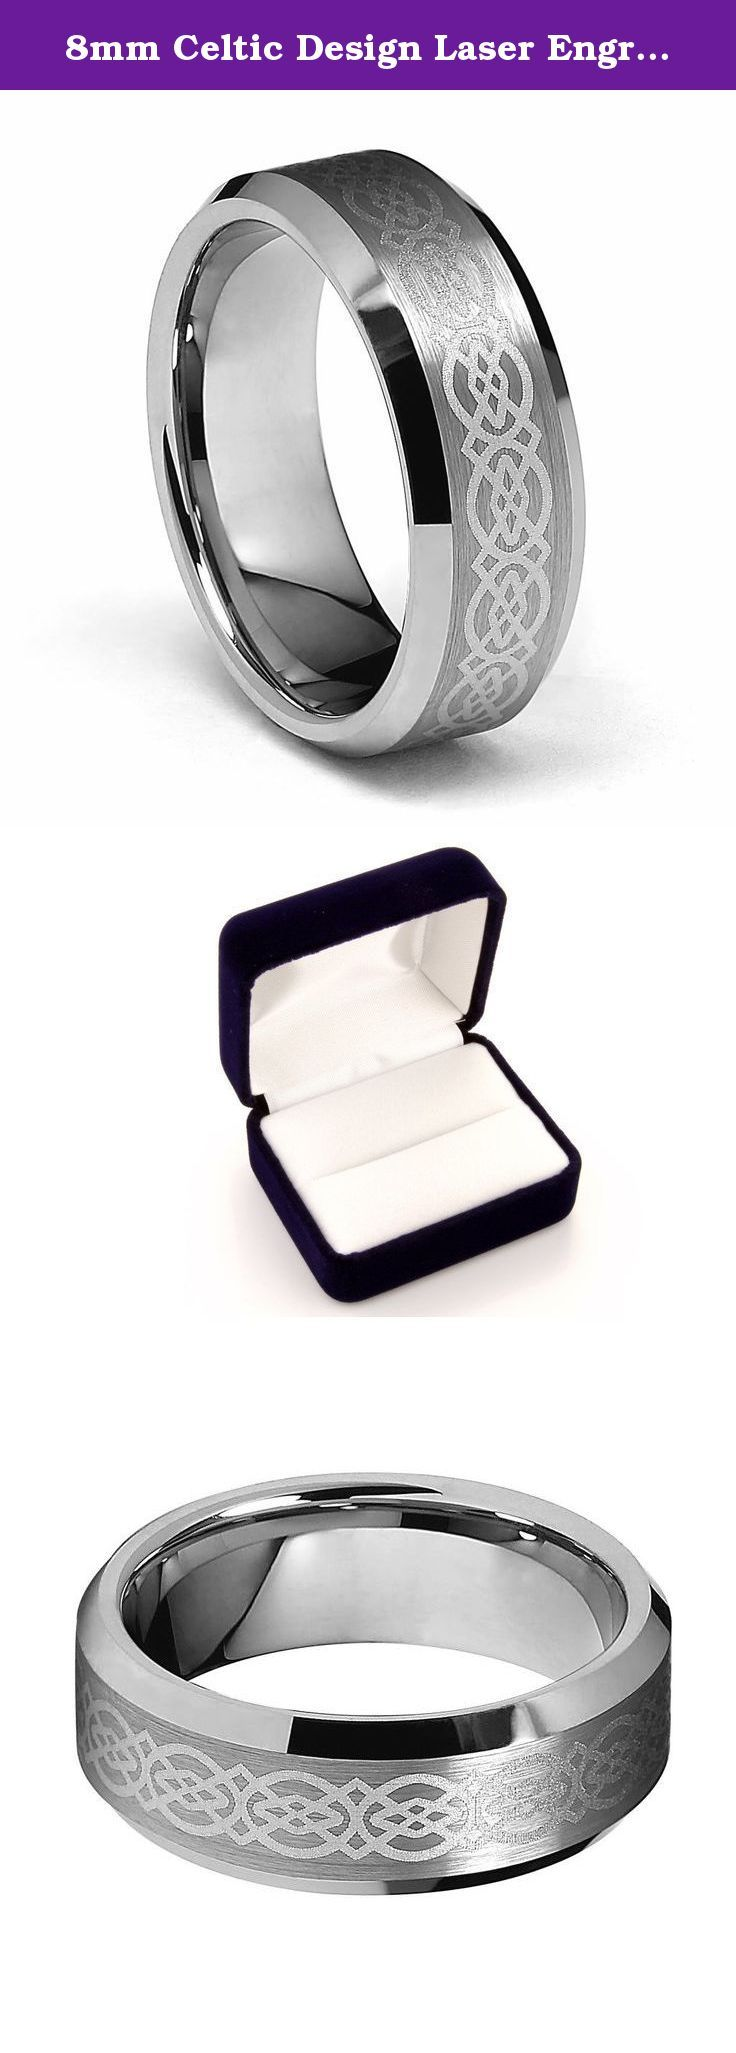 8mm Celtic Design Laser Engraved Men's Tungsten Wedding